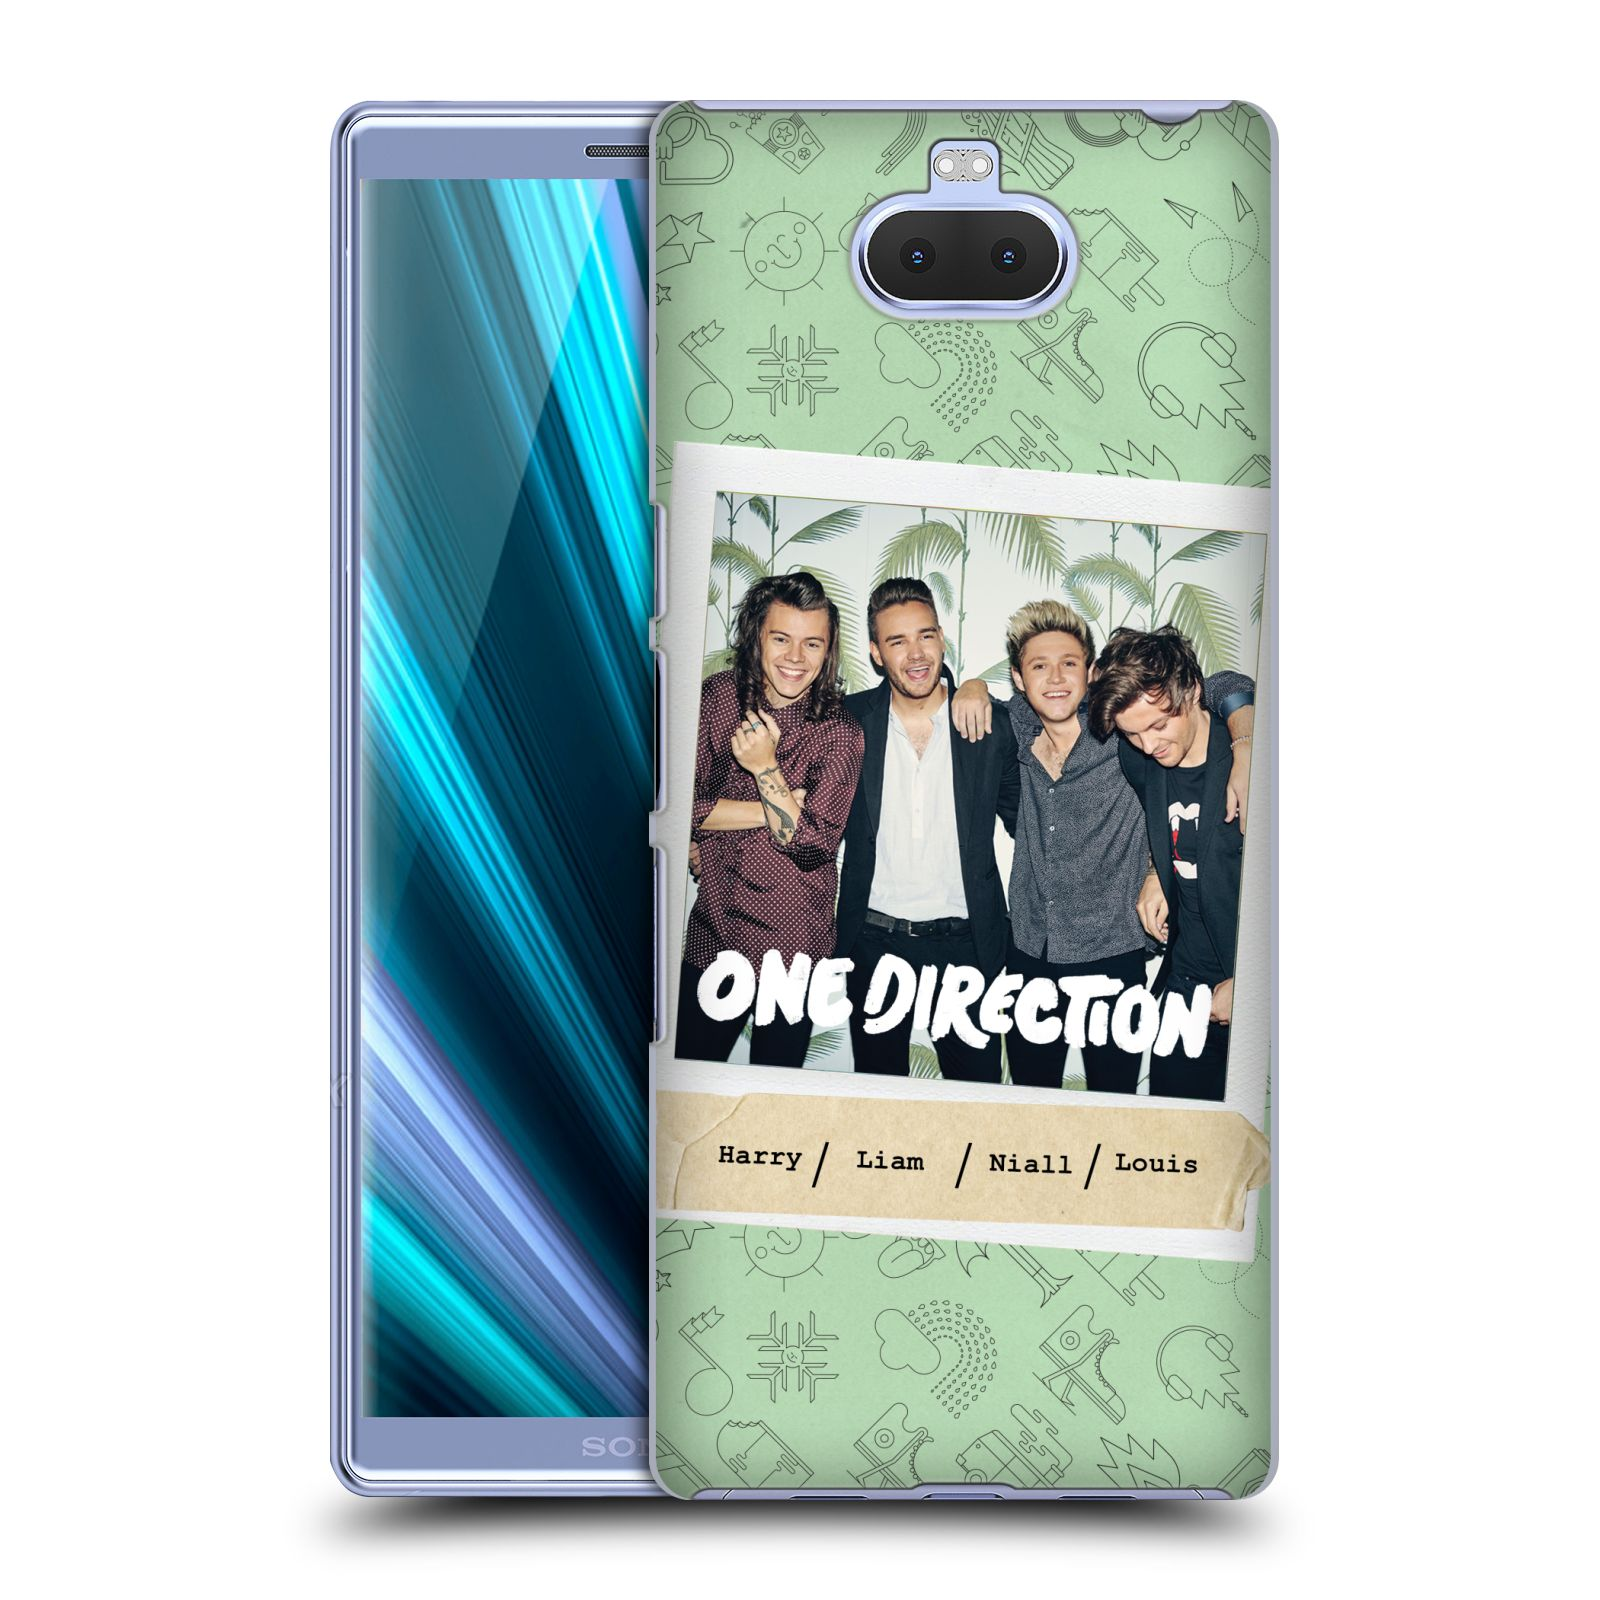 Pouzdro na mobil Sony Xperia 10 - Head Case - chlapecká skupina One Direction skupinové foto zelené pozadí